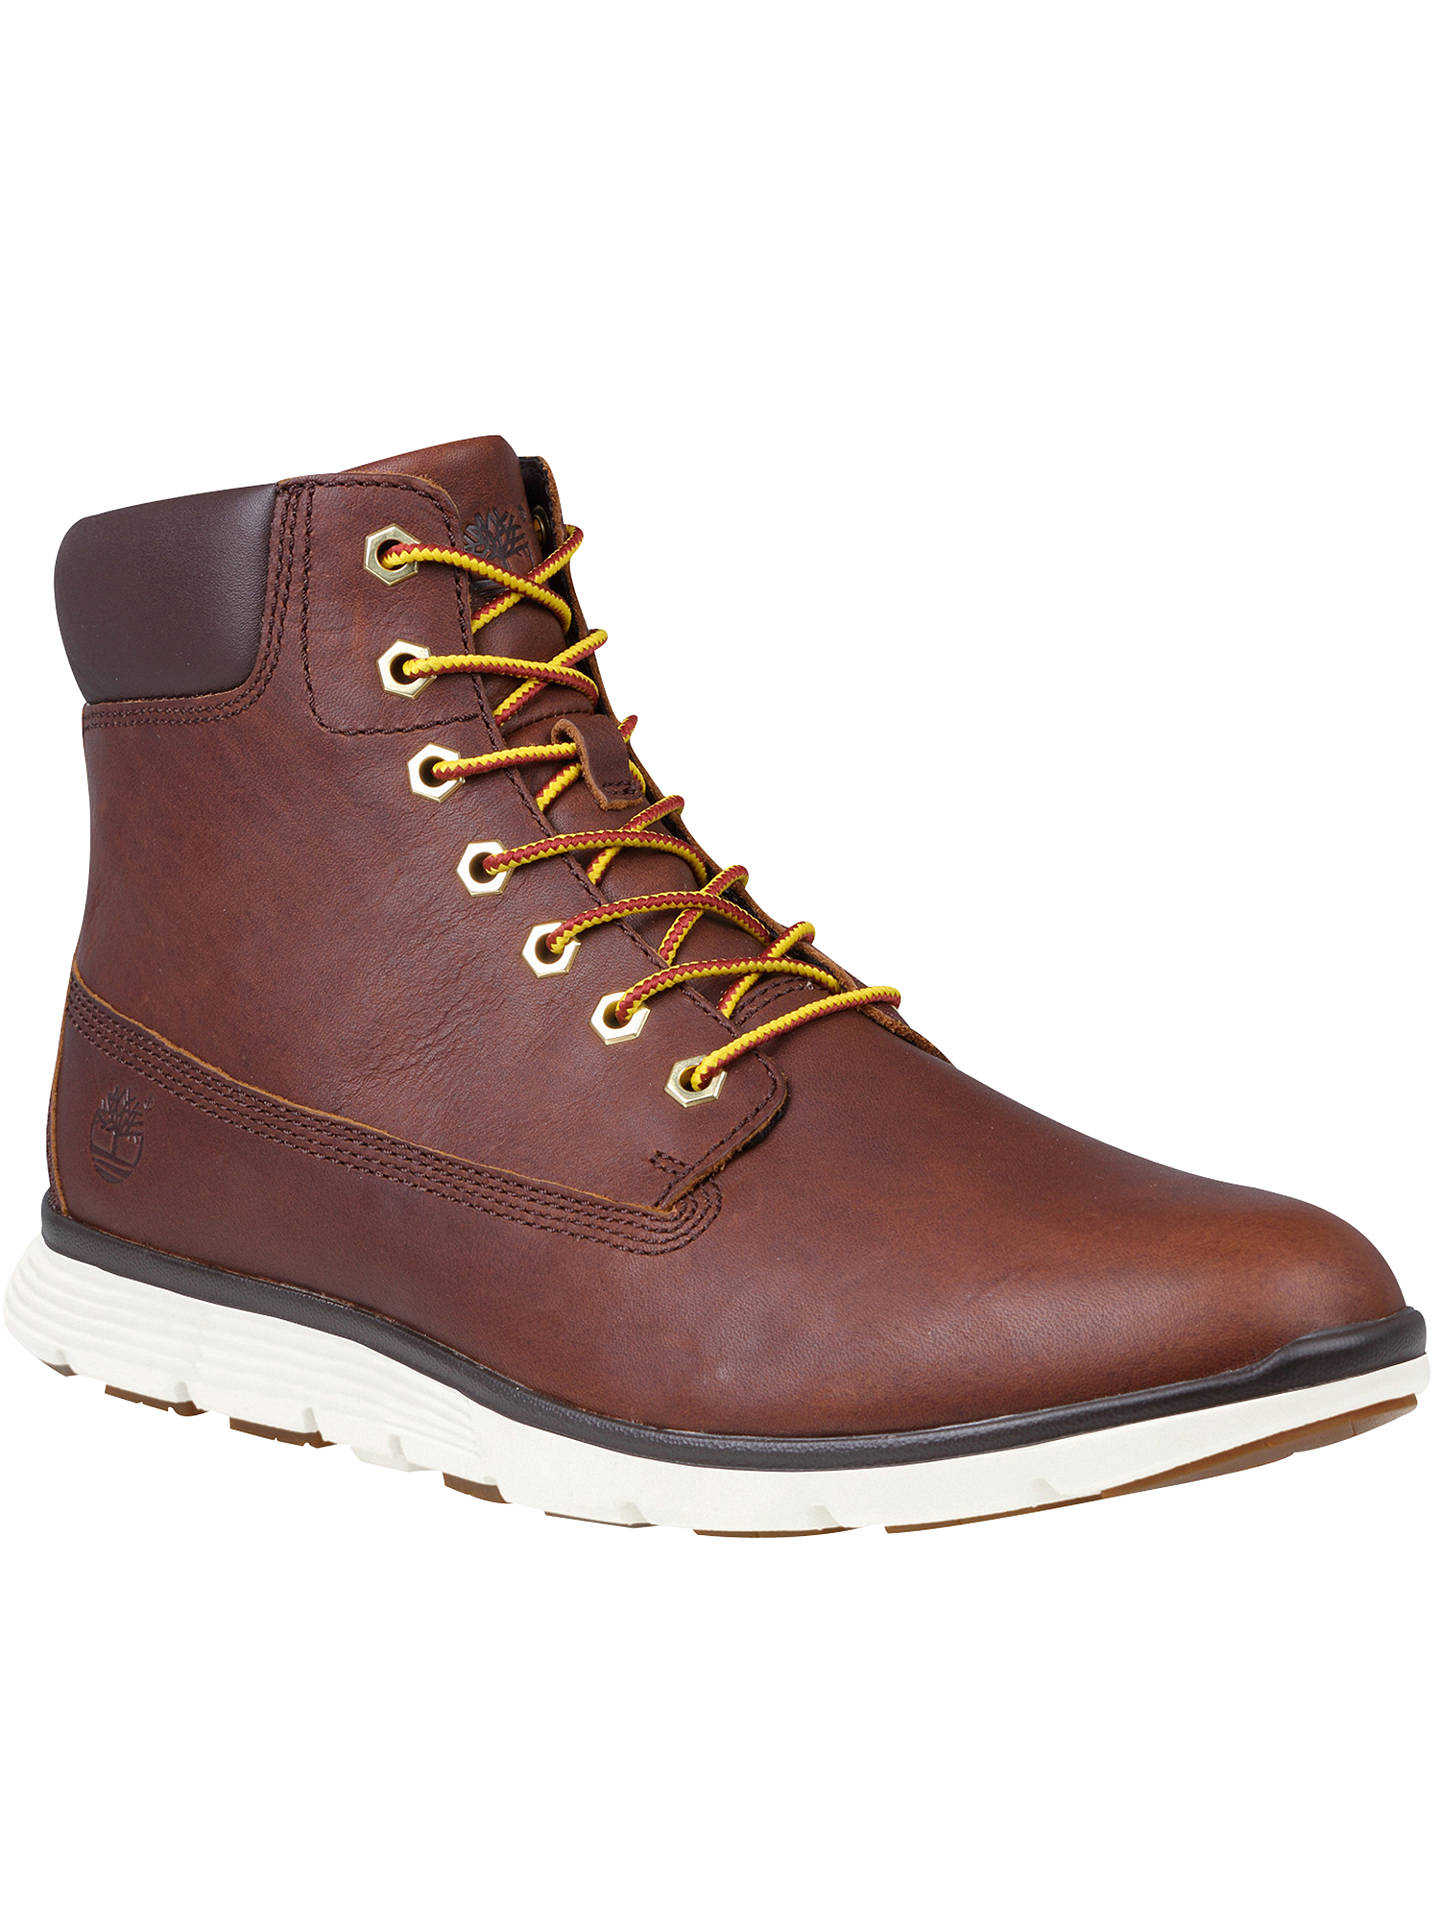 d17cffaa49 Buy Timberland Killington 6-Inch Boots, Brown, 7 Online at johnlewis.com